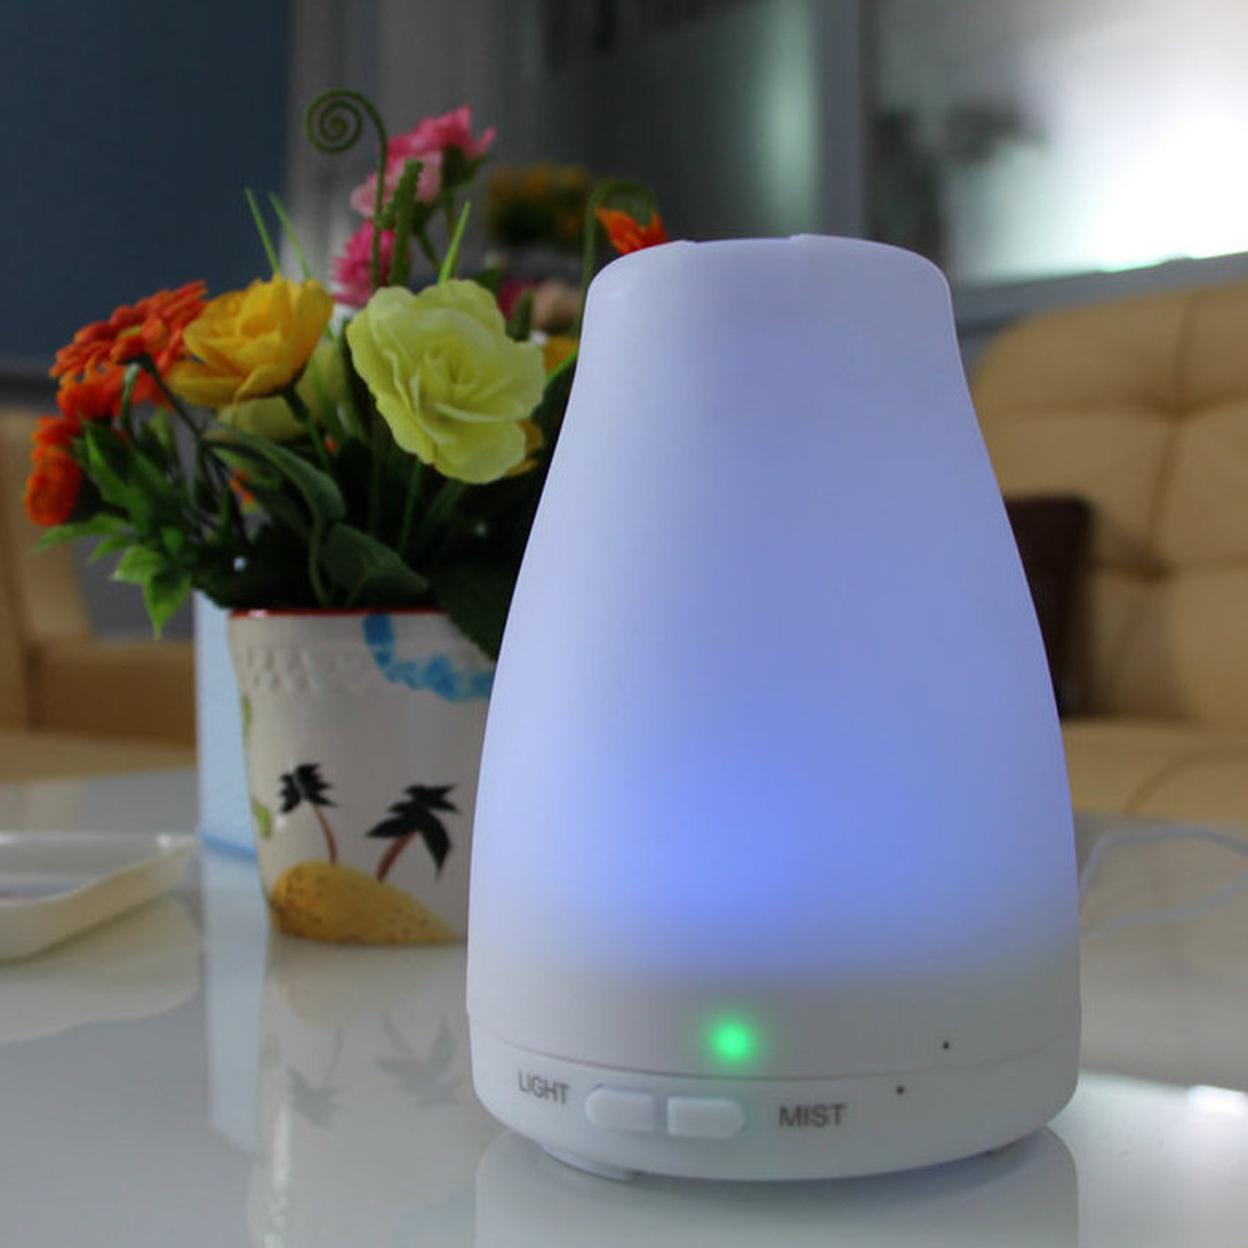 Ultrasonic Cool Mist Aroma Humidifier 59f5f4a12a00e42c683e522f